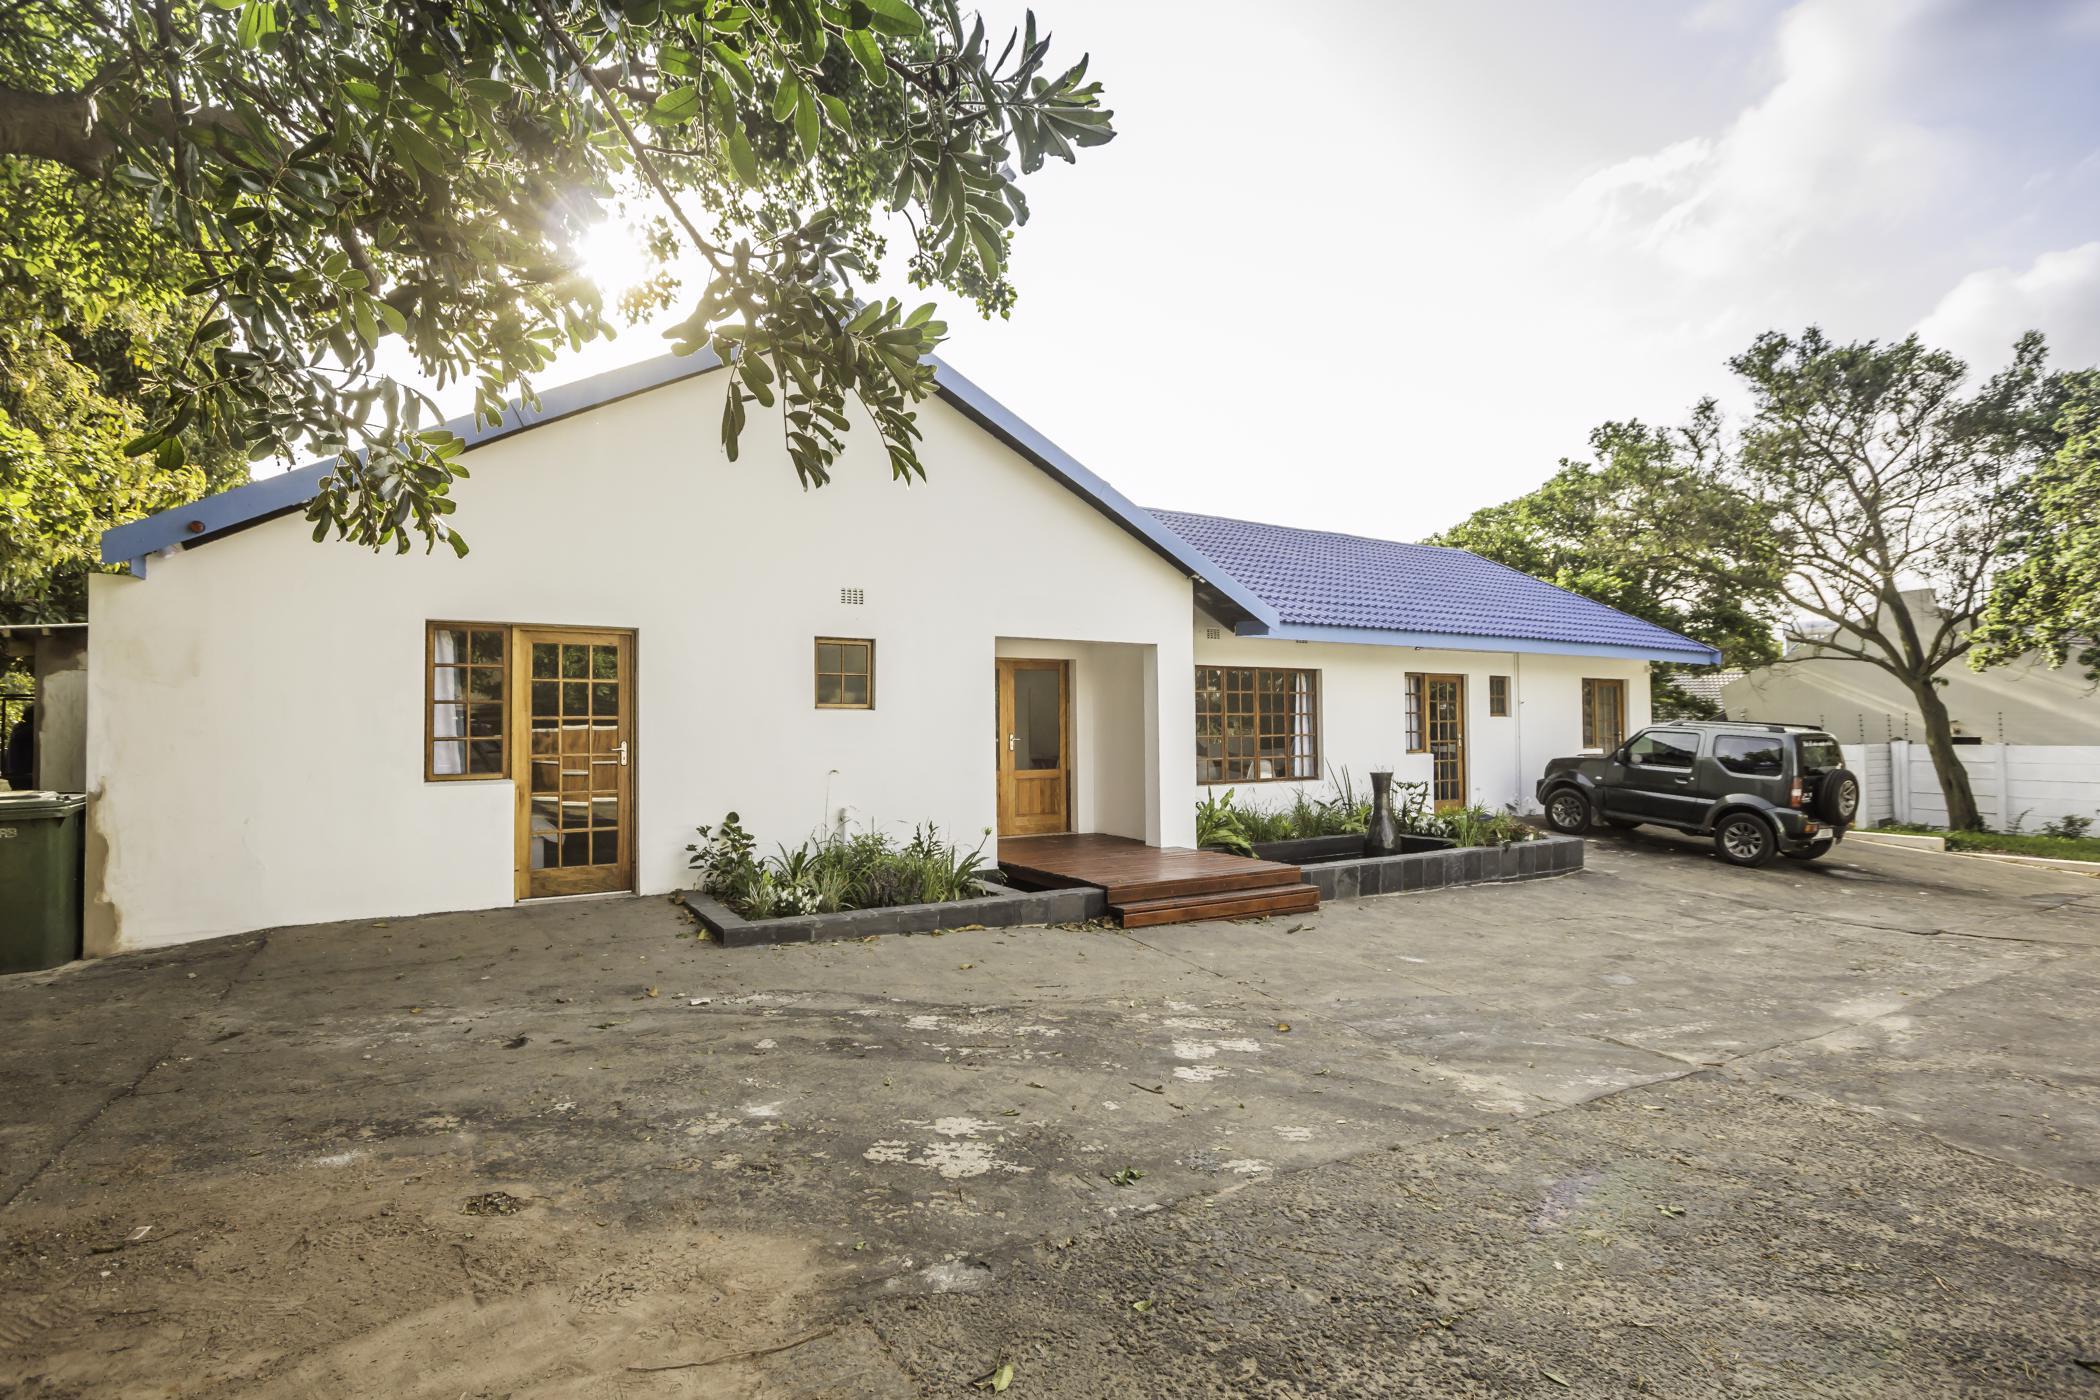 12 bedroom house to rent in Arboretum (Richards Bay)